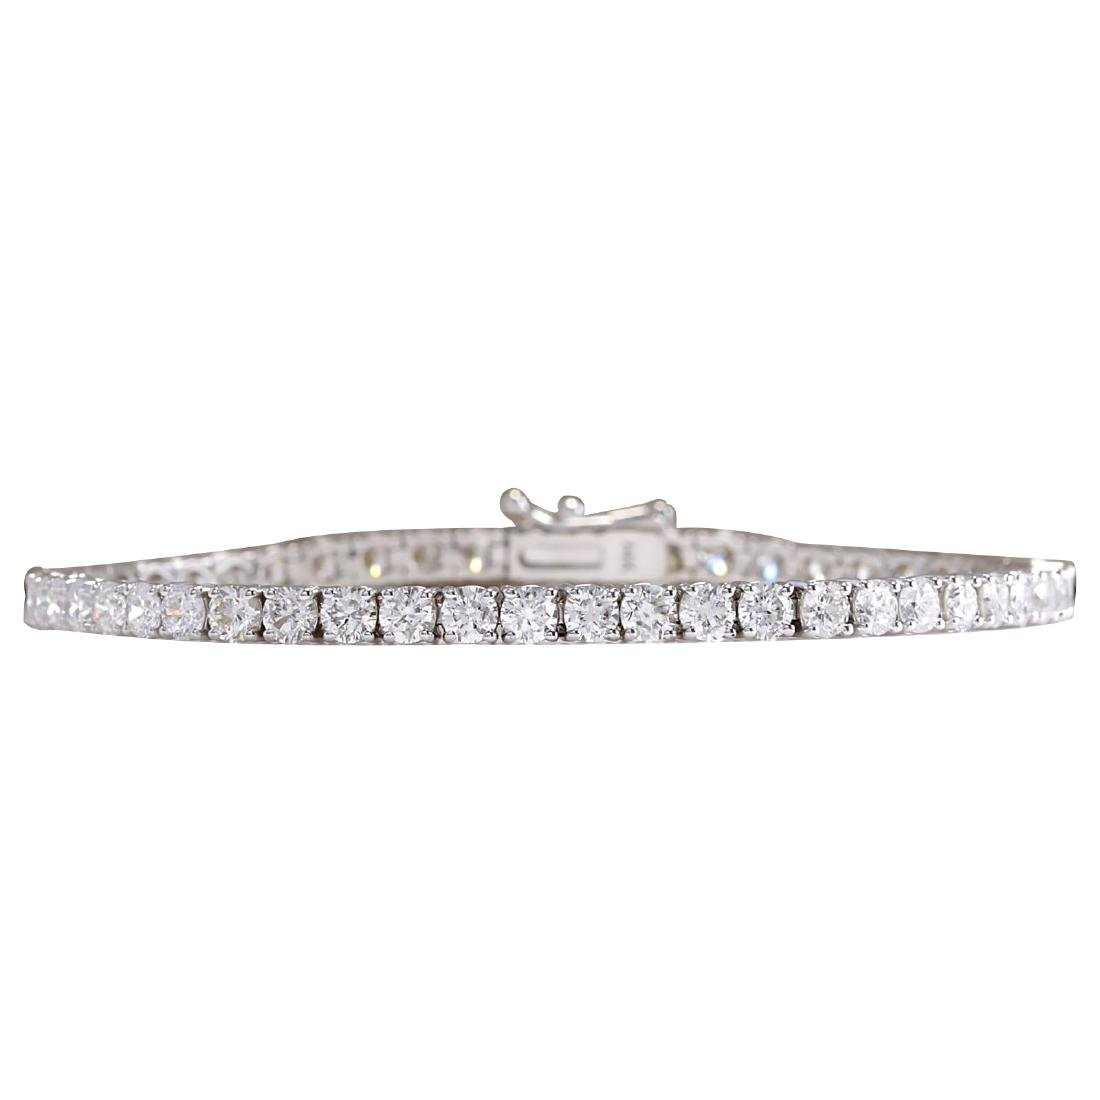 6.85CTW Natural Diamond Bracelet In 18K Solid White